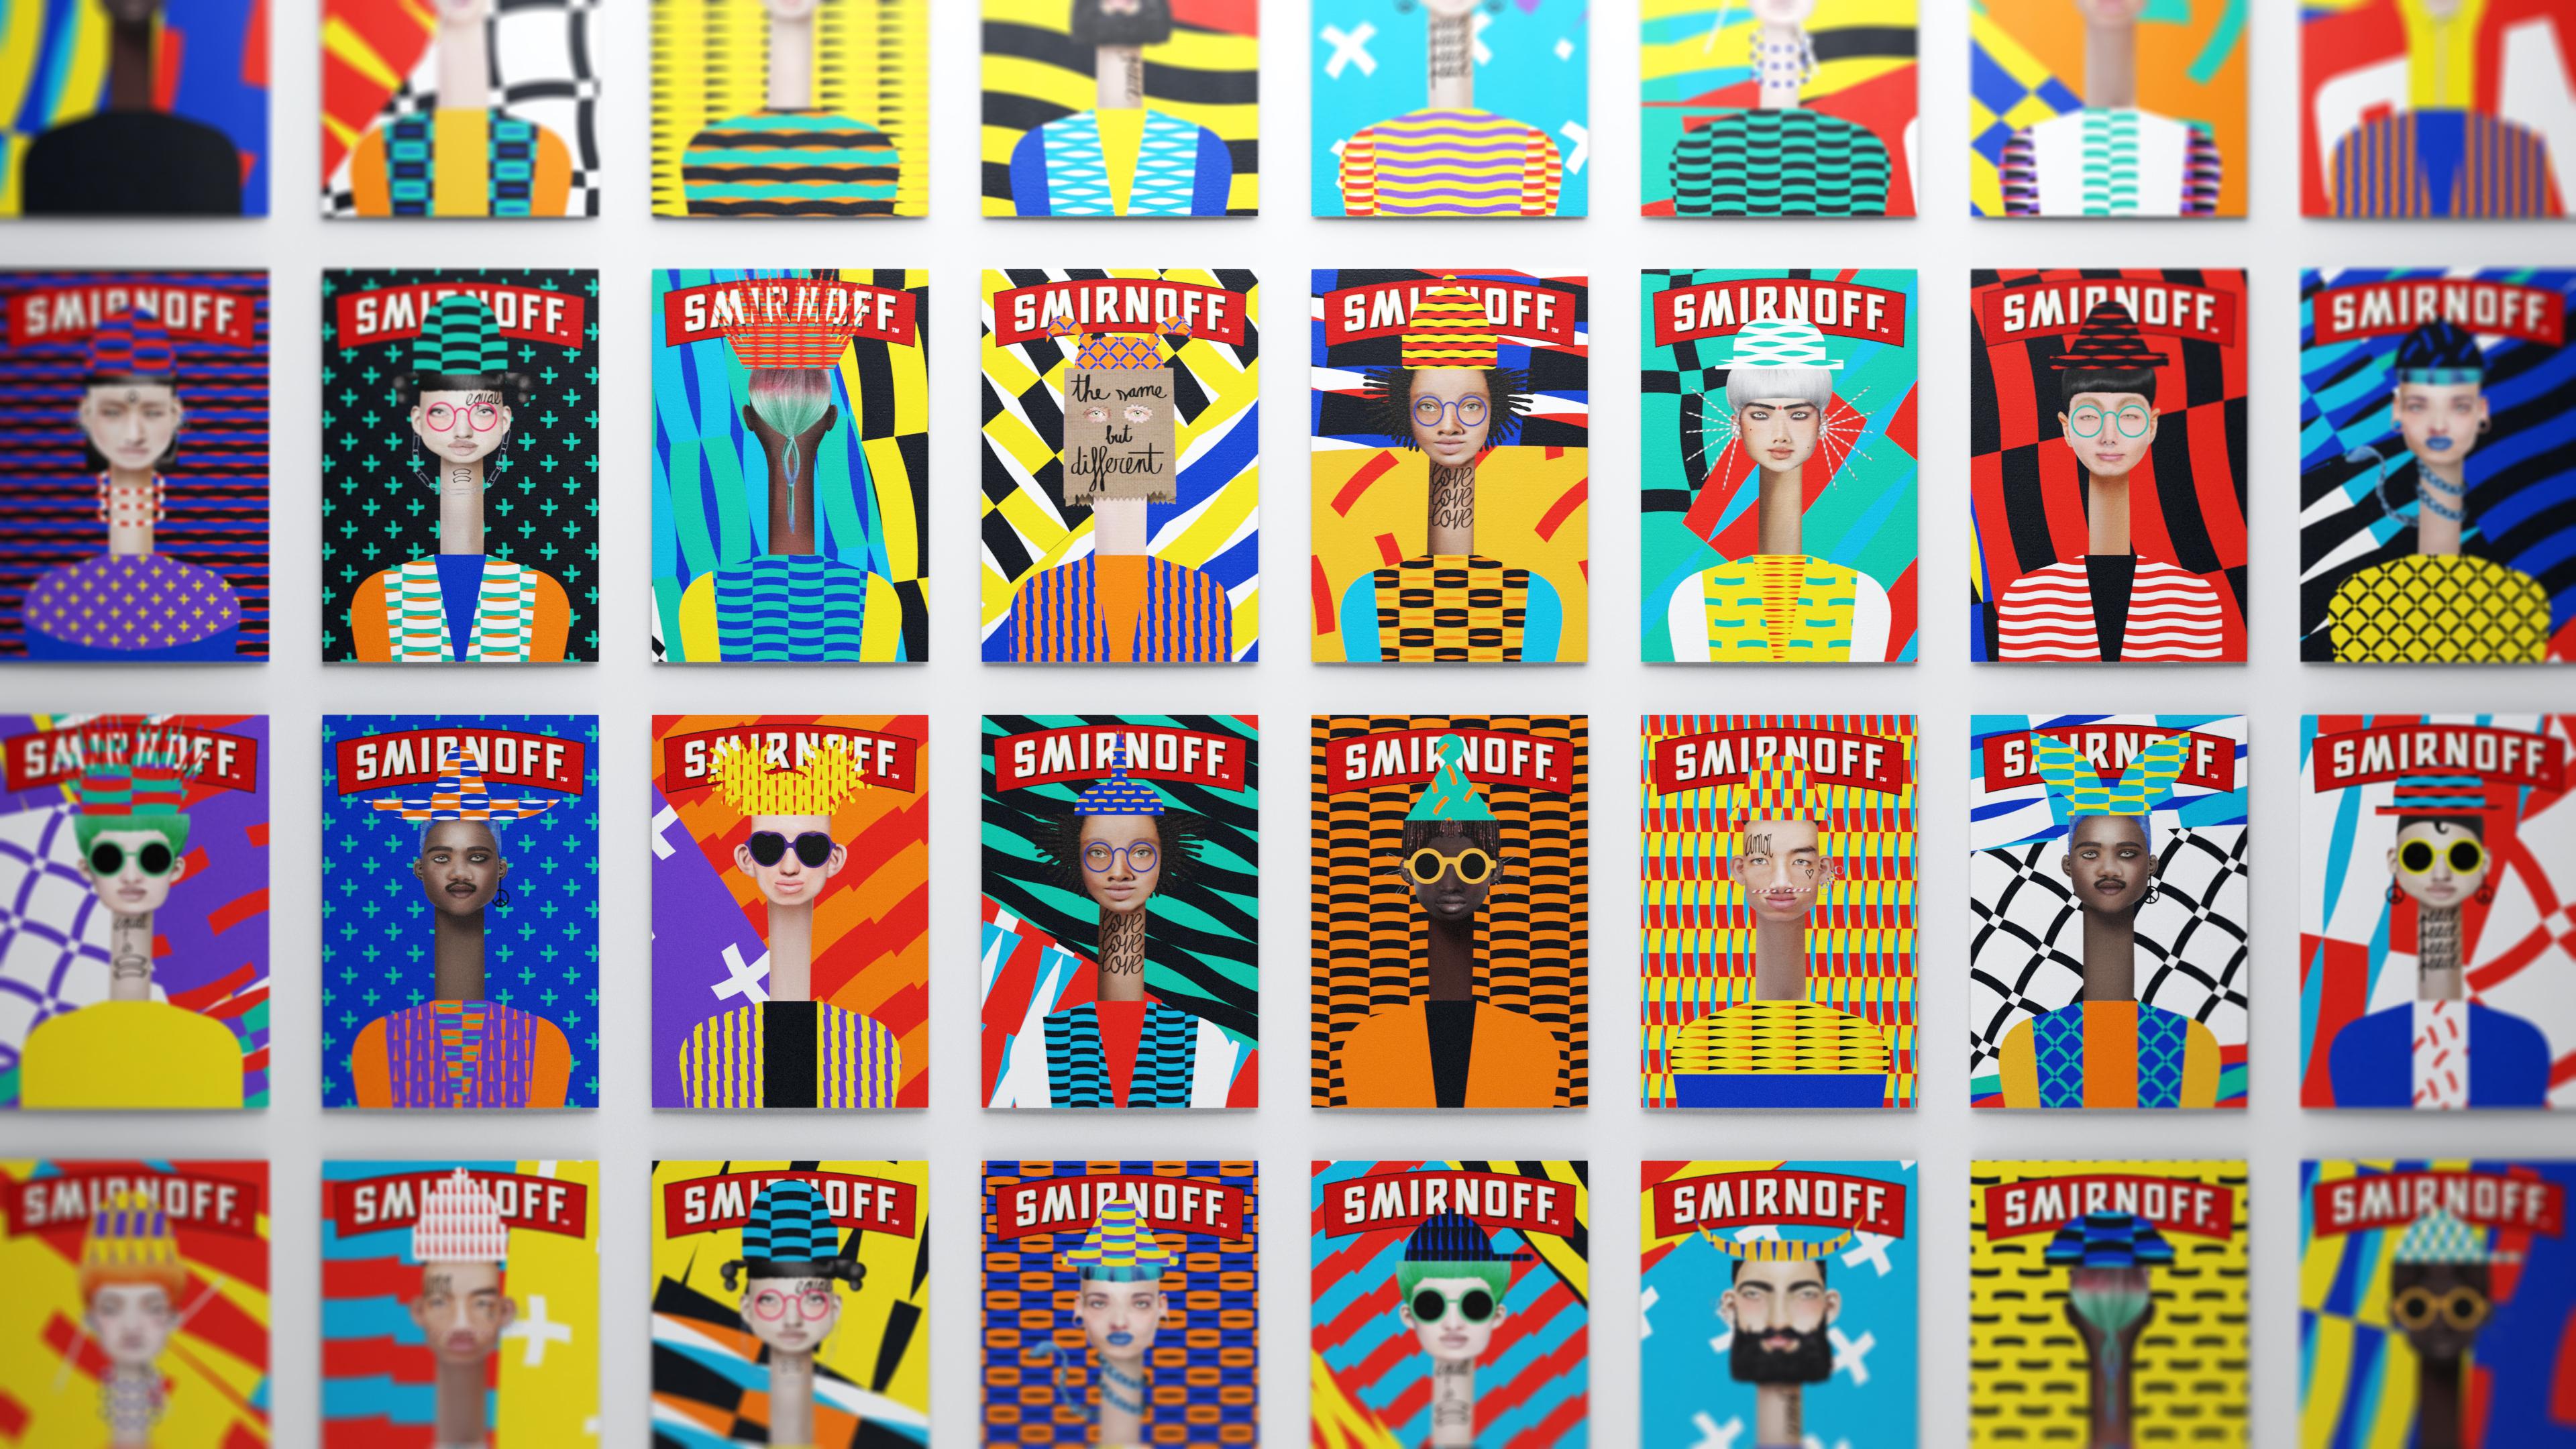 Smirnoff_Poster-All1